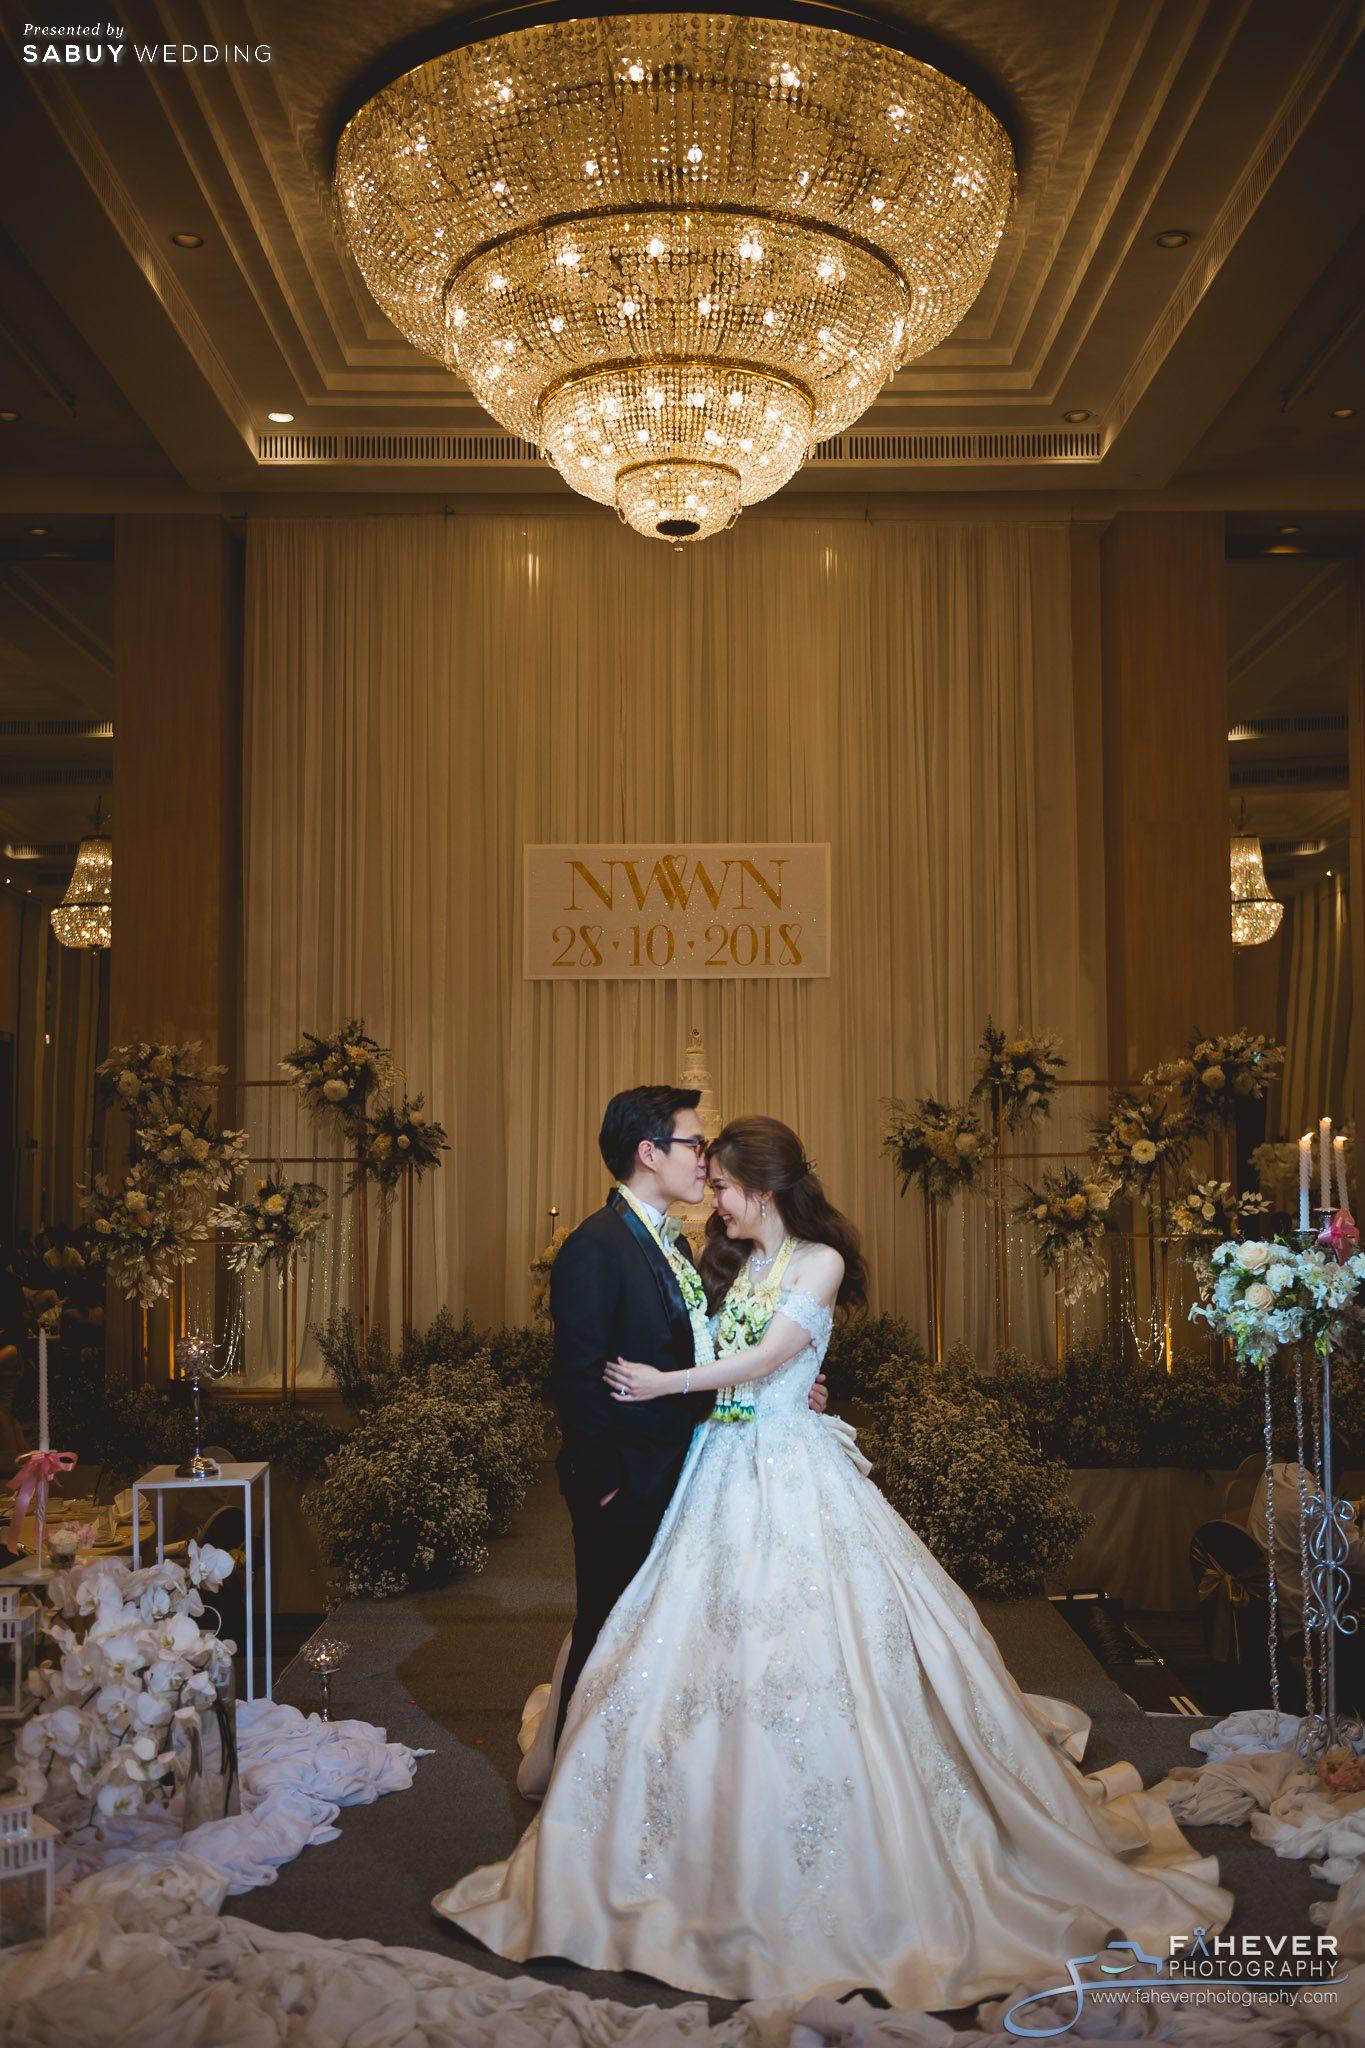 Swissotel Bangkok Ratchada,Fahever Photography,สถานที่แต่งงาน,สถานที่จัดงานแต่งงาน,โรงแรม,งานแต่งงาน,บ่าวสาว,ถ่ายรูปแต่งงาน,รูปงานแต่ง,พิธีแต่งงาน Swissotel Bangkok Ratchada โรงแรมสุดหรูย่านห้วยขวาง ราคาย่อมเยา